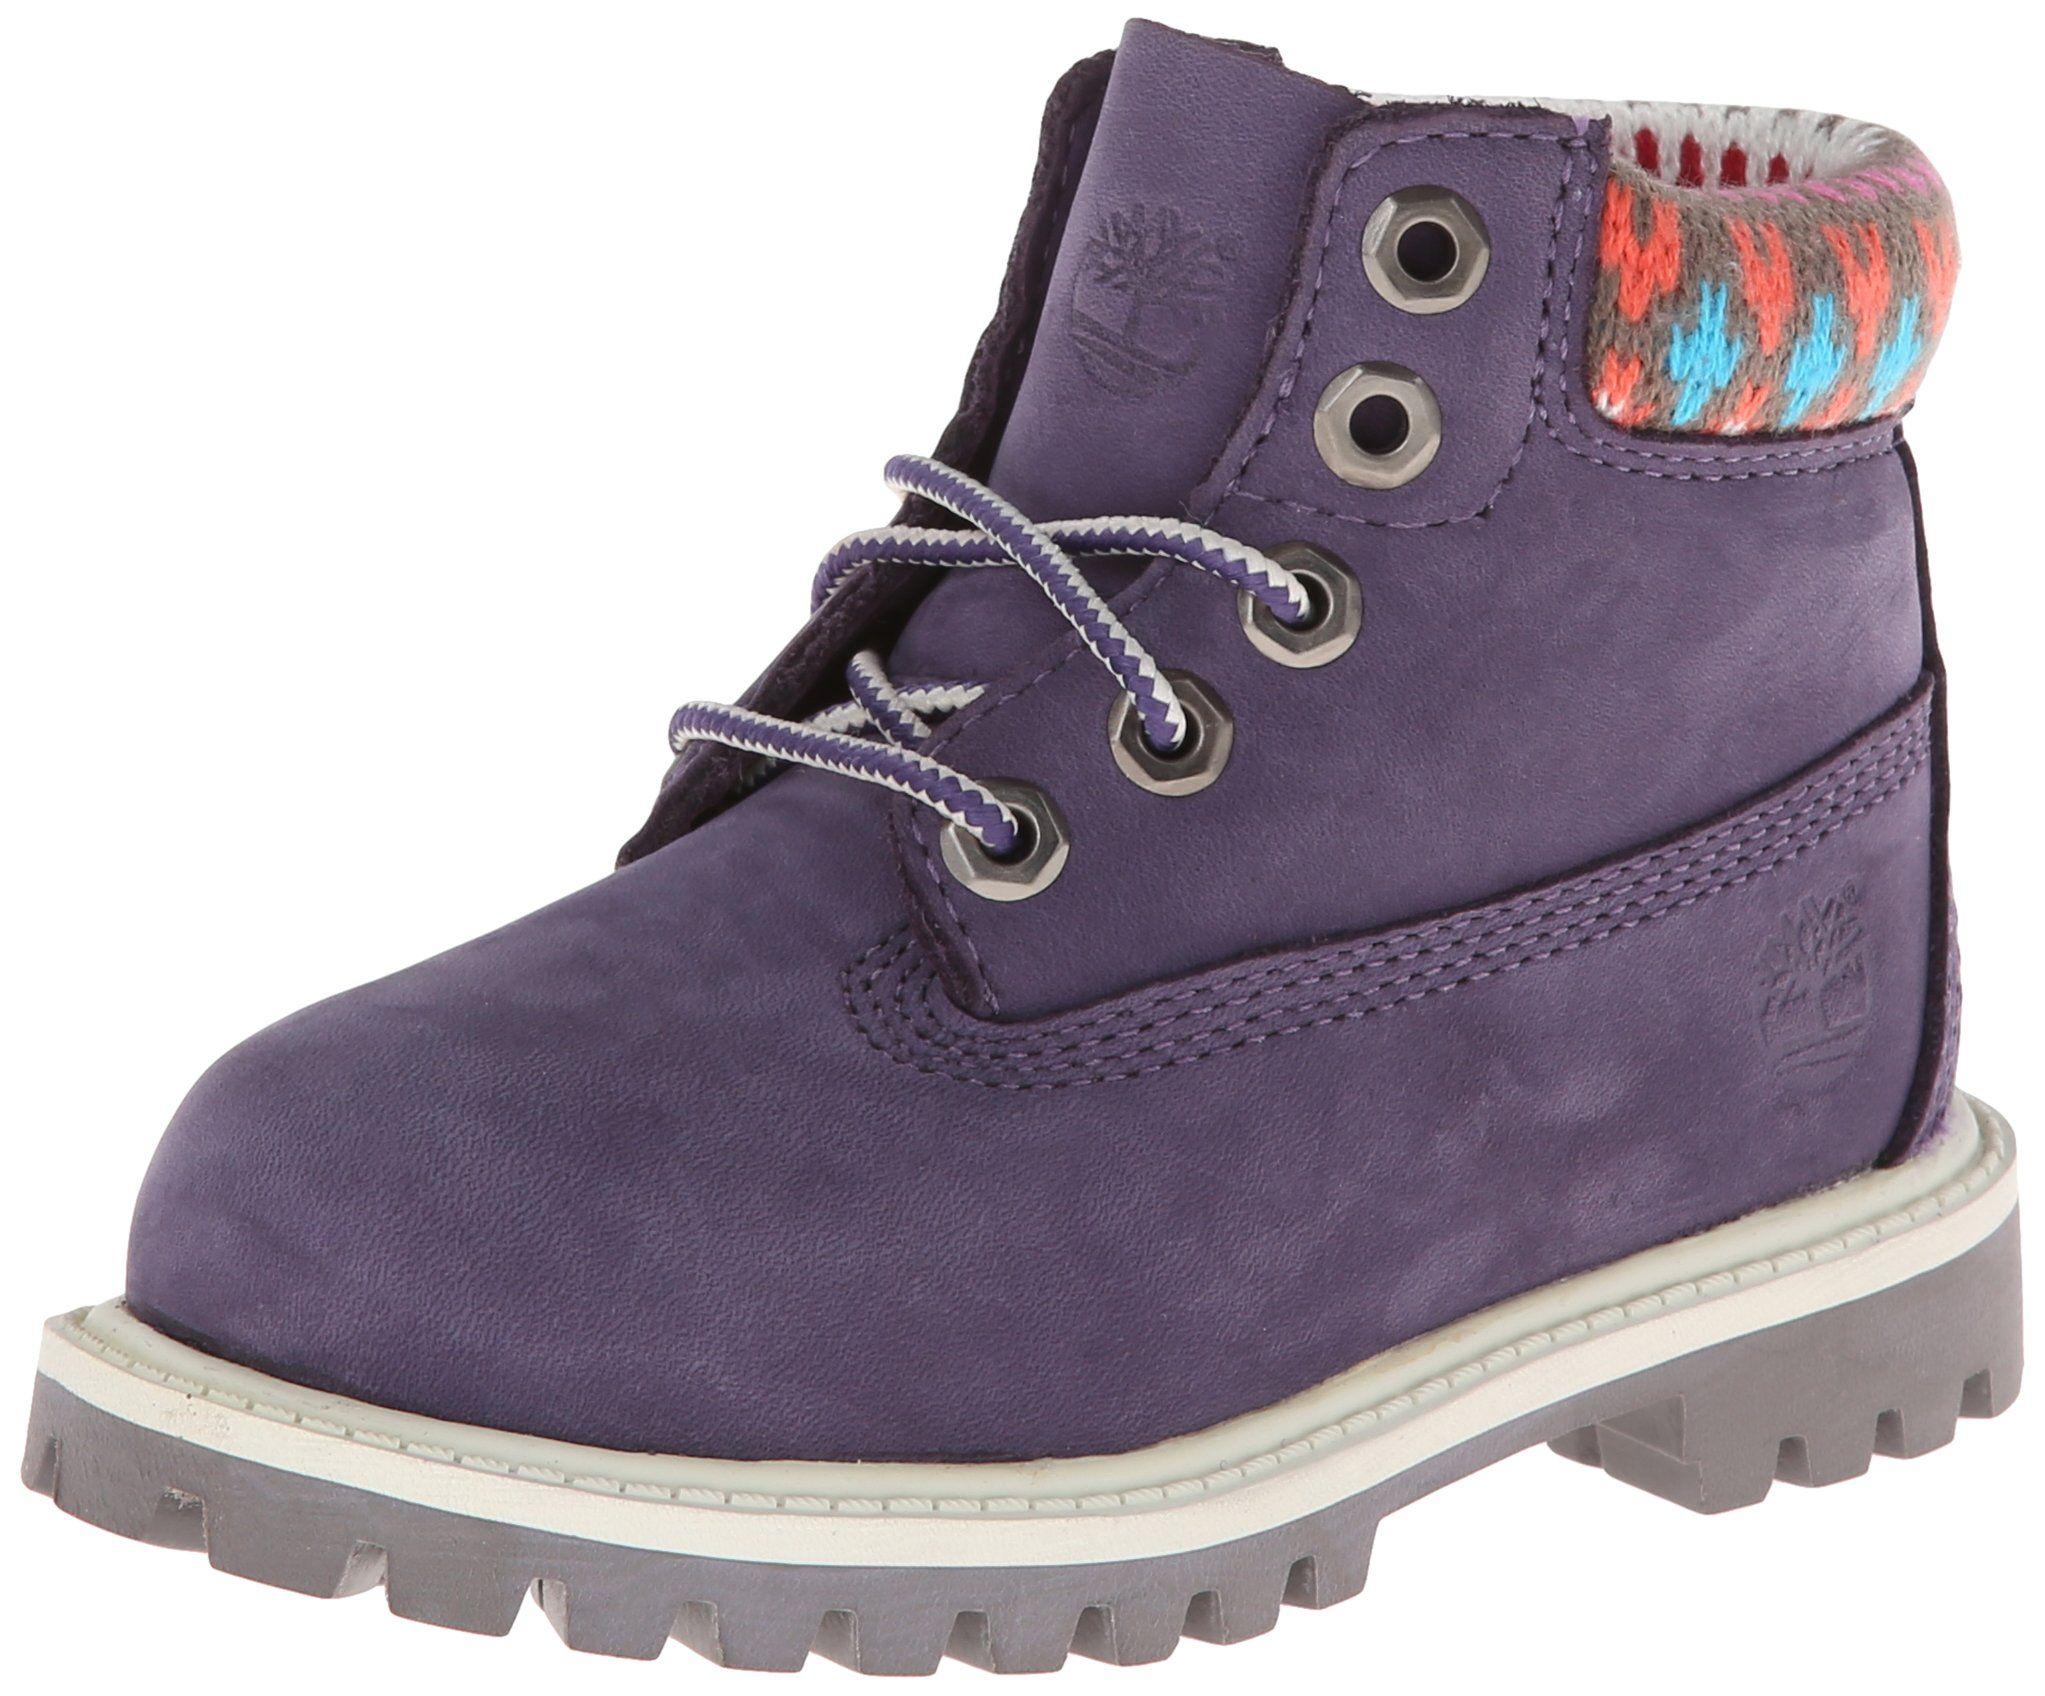 e776625b492c Timberland Kids Purple with Multi Sweater 6 Premium Waterproof Toddler 9.0  B(M) US Toddler